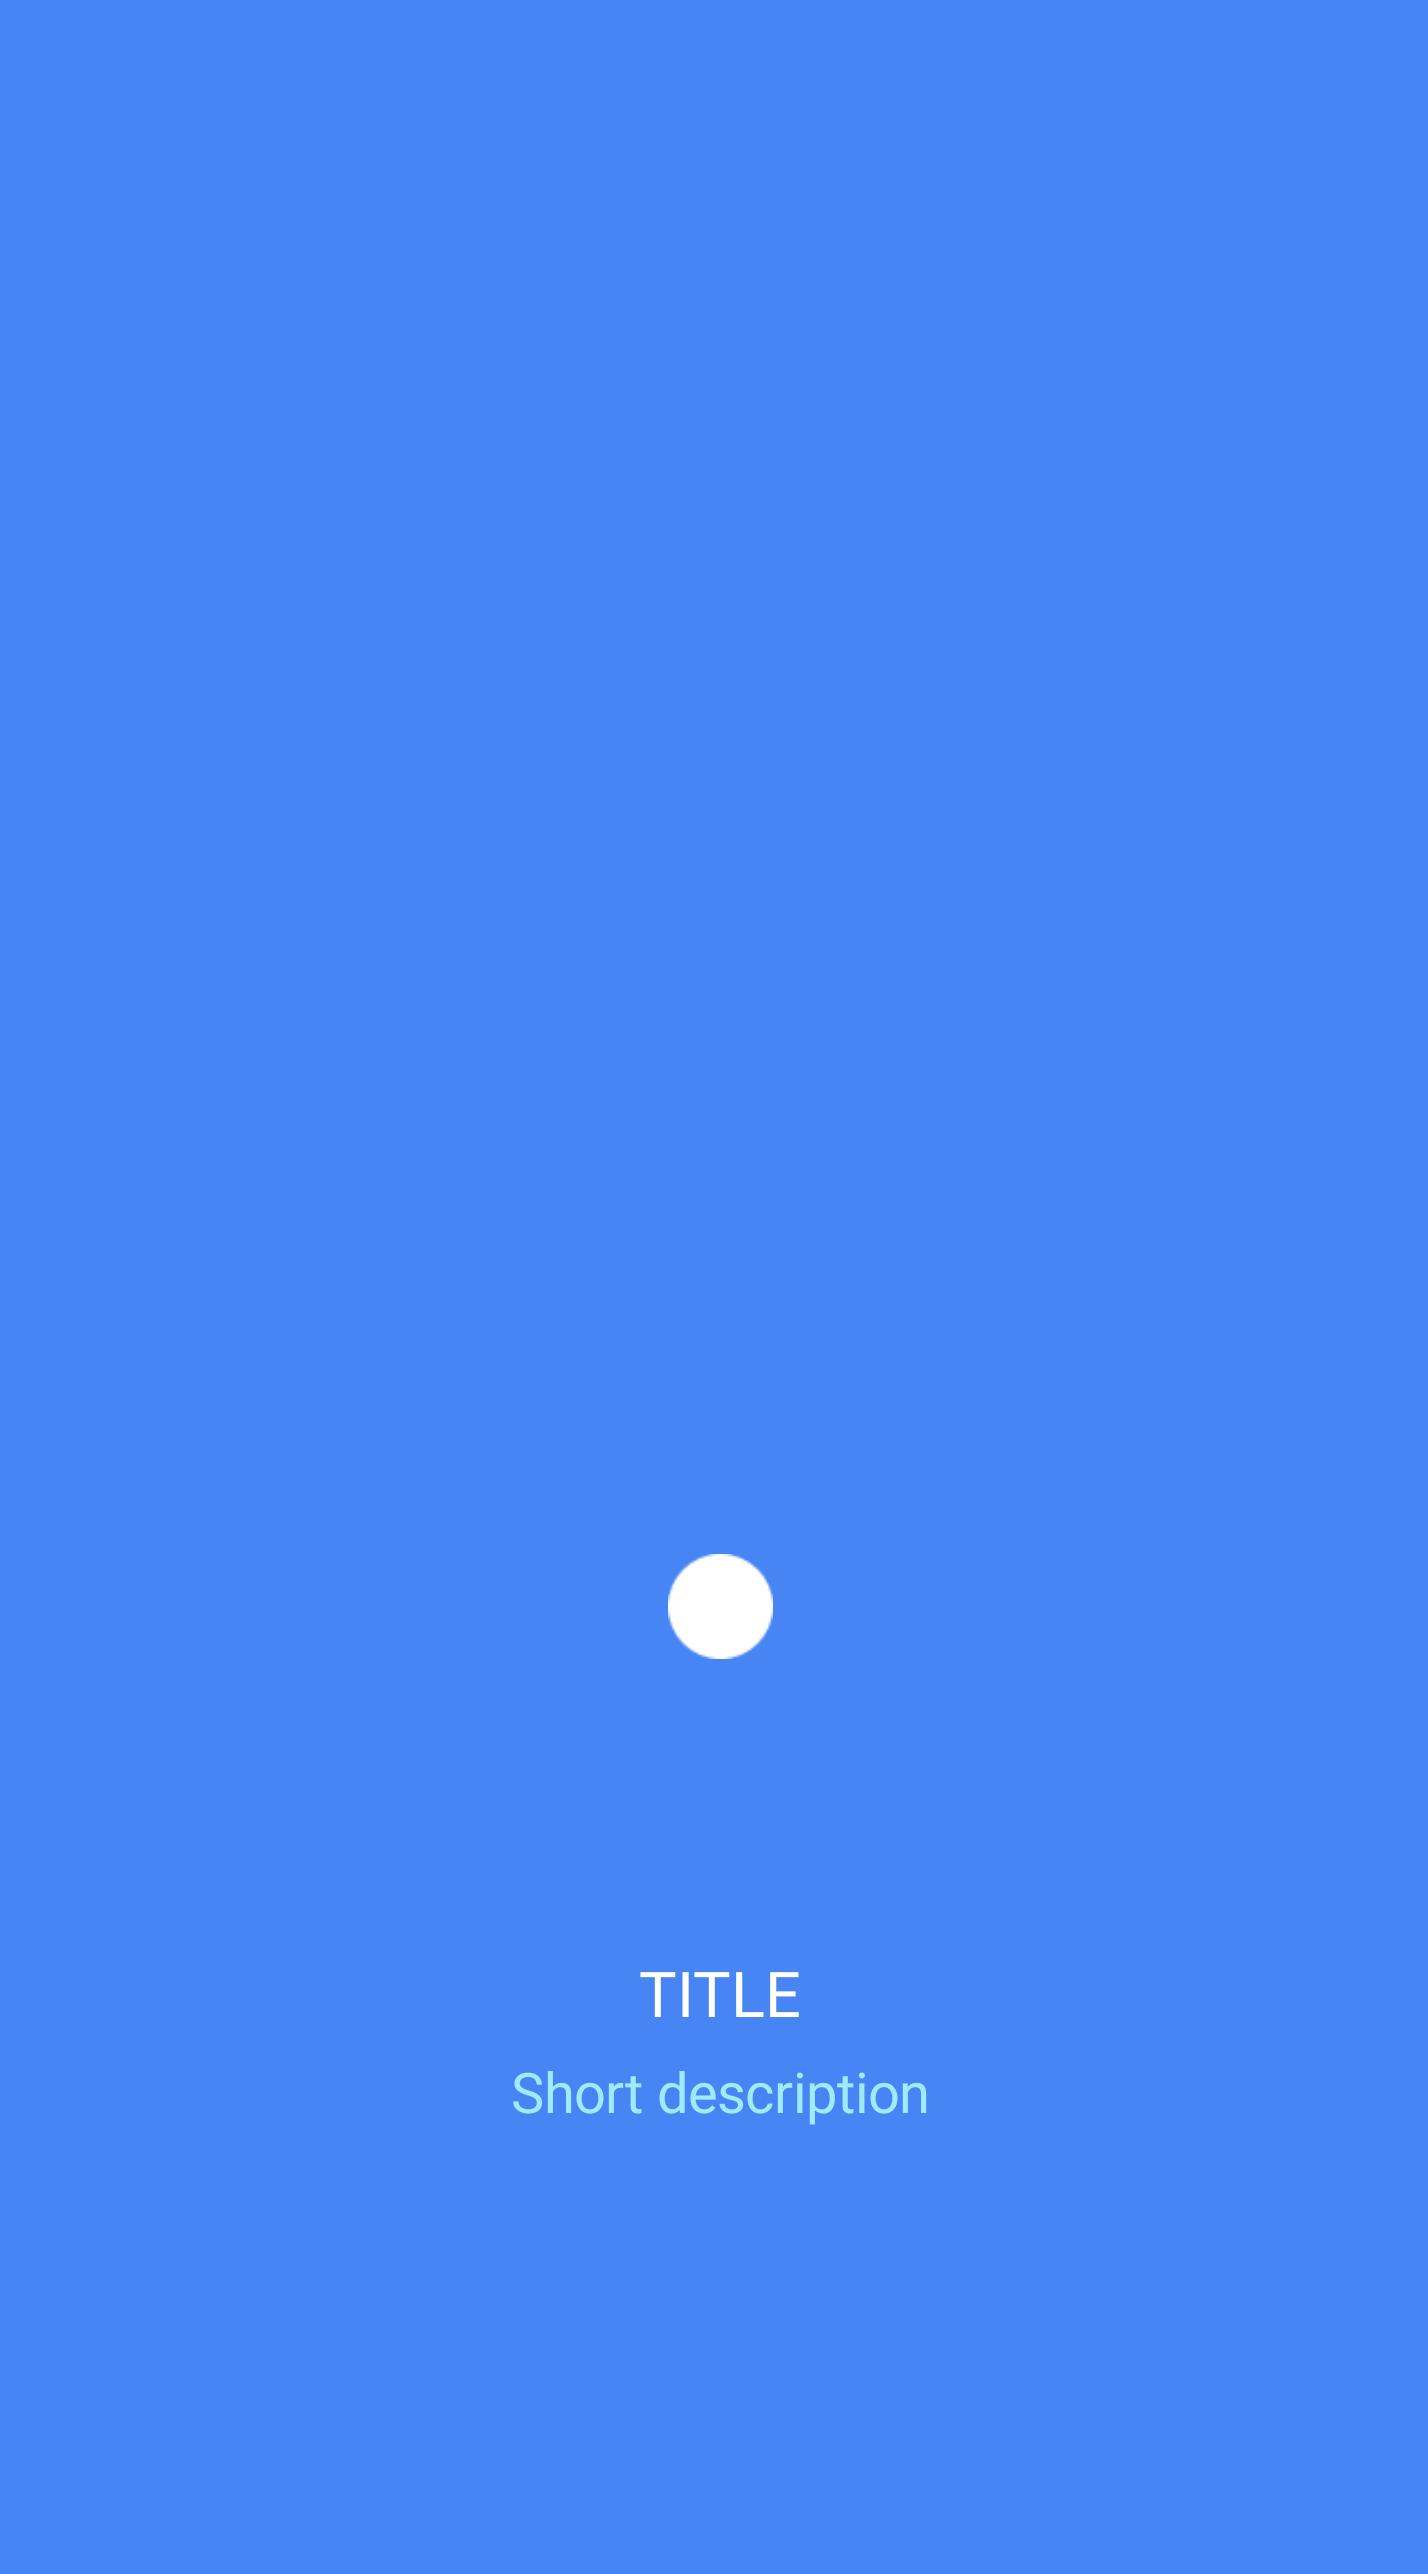 Interstitial Screens - Screen-Thumbnail